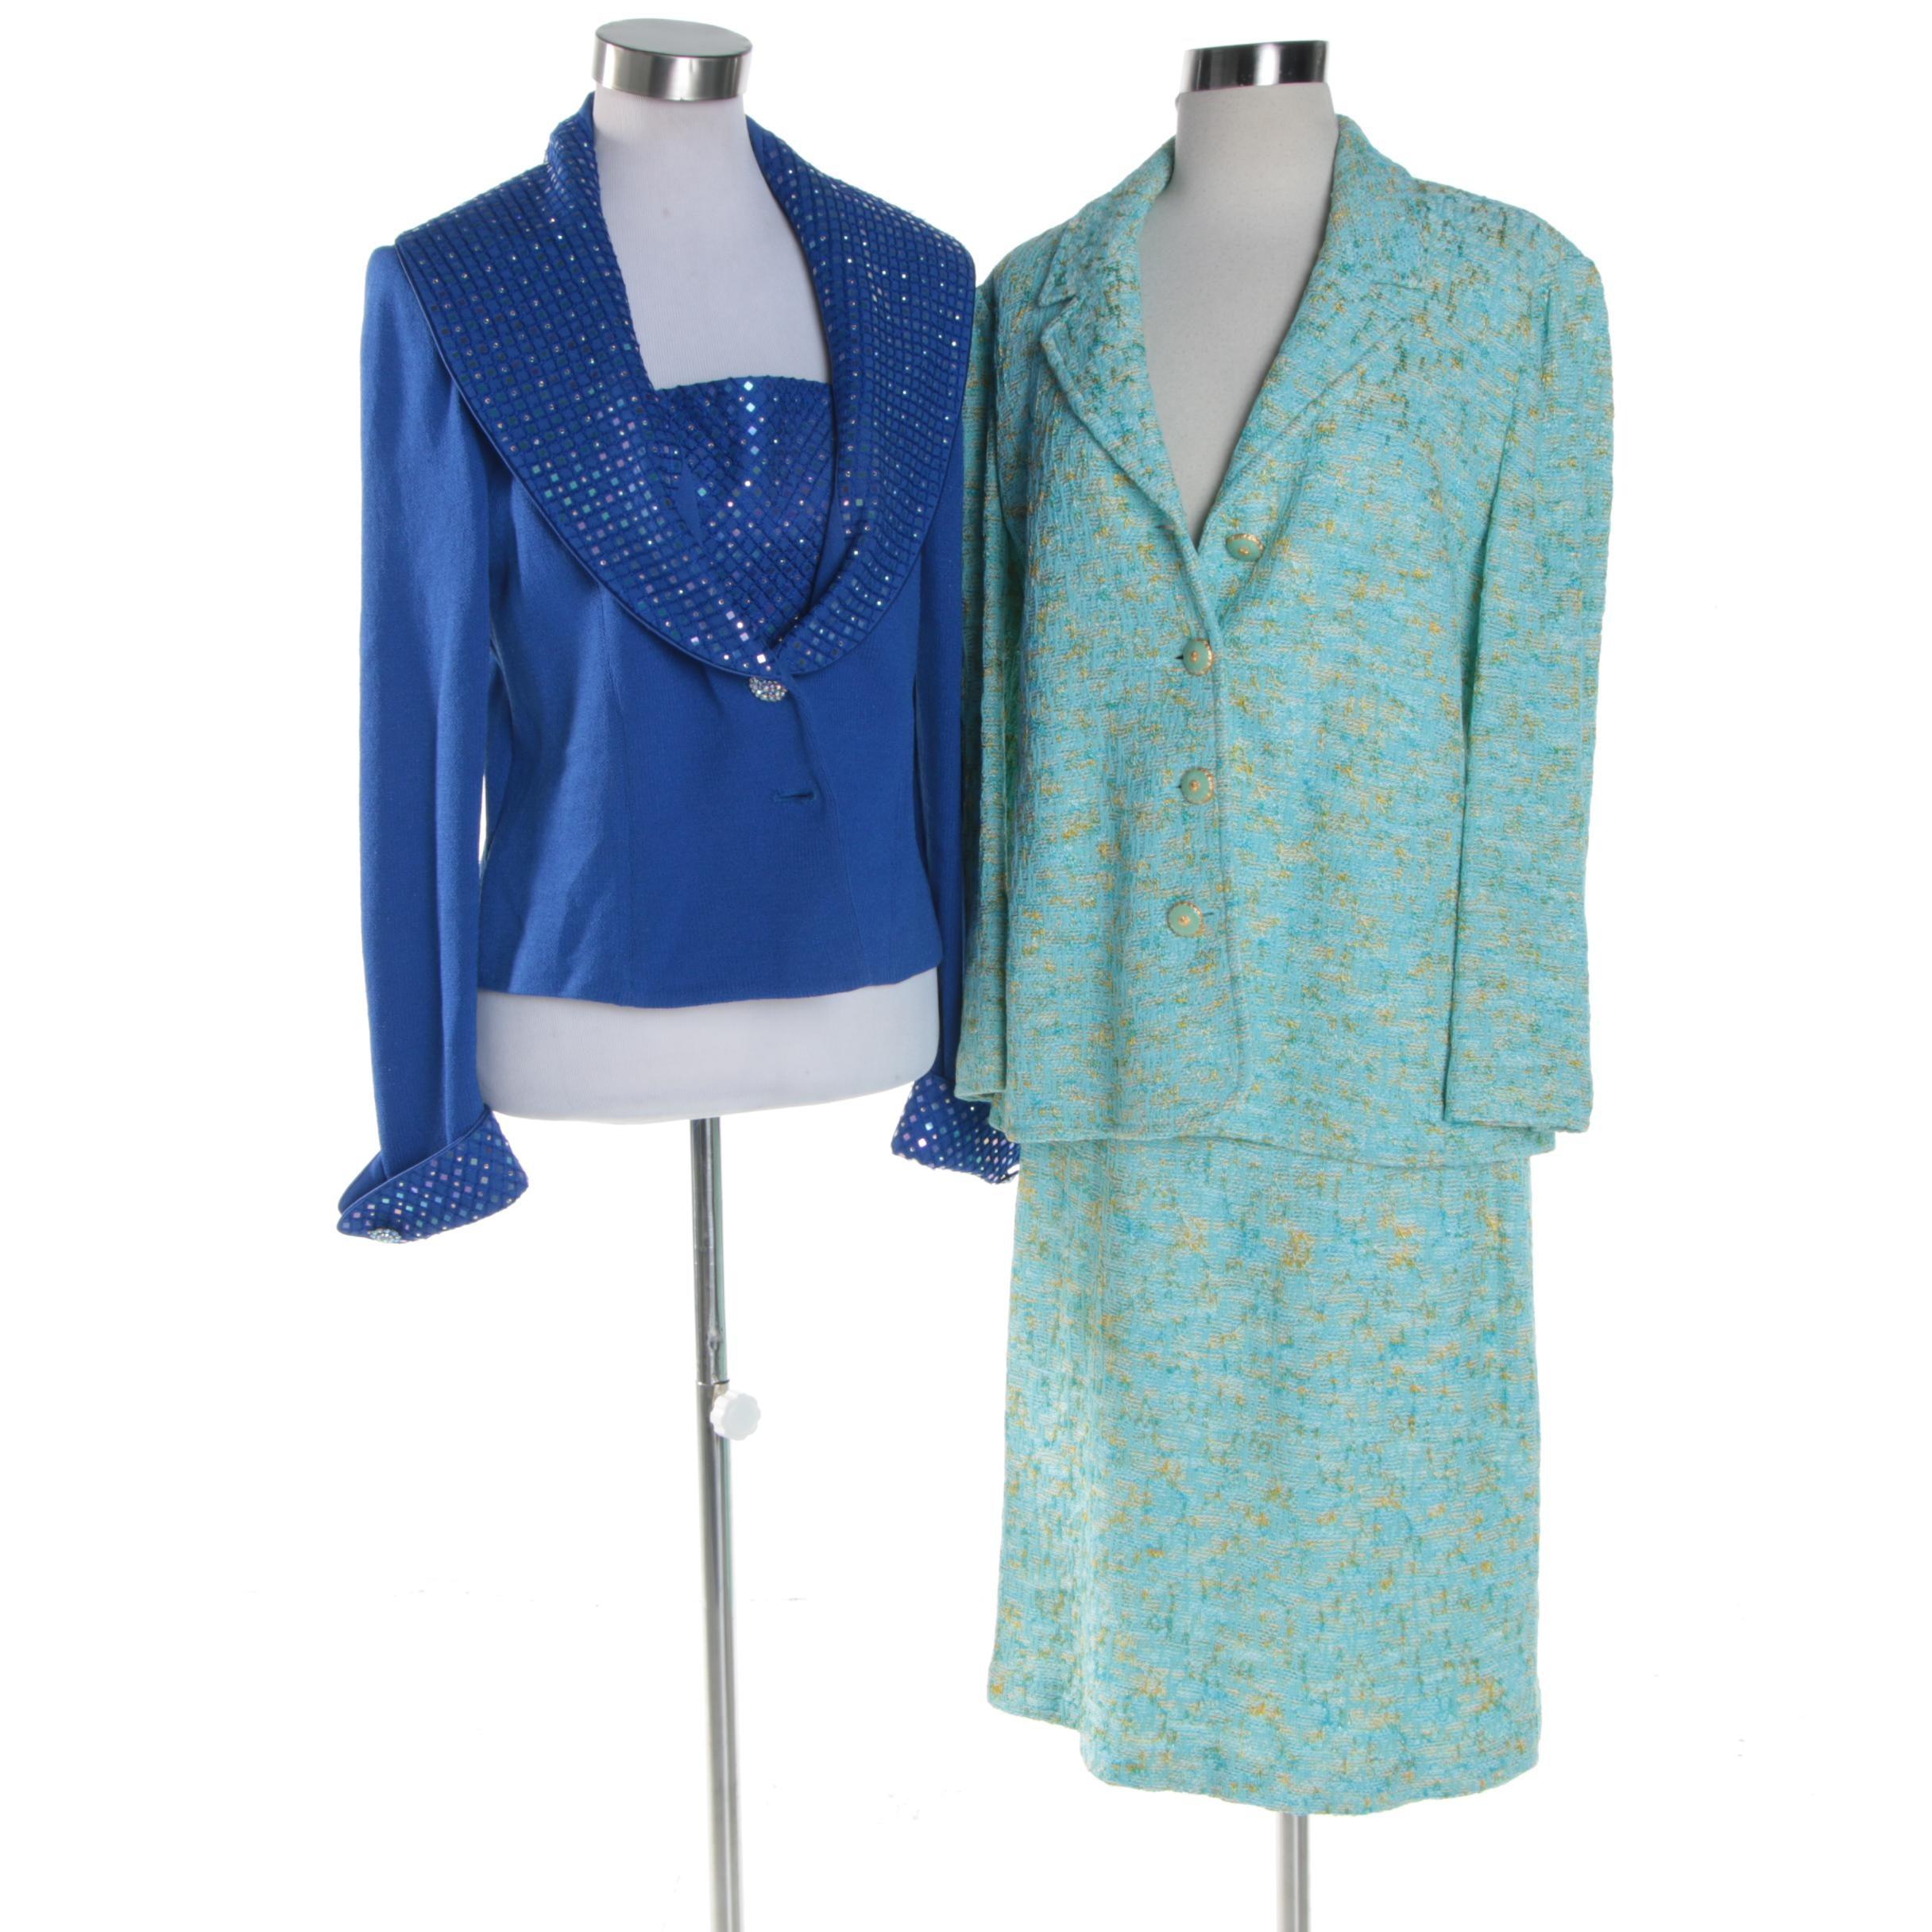 Women's St. John Collection Knit Skirt Suit and St. John Evening Blue Jacket